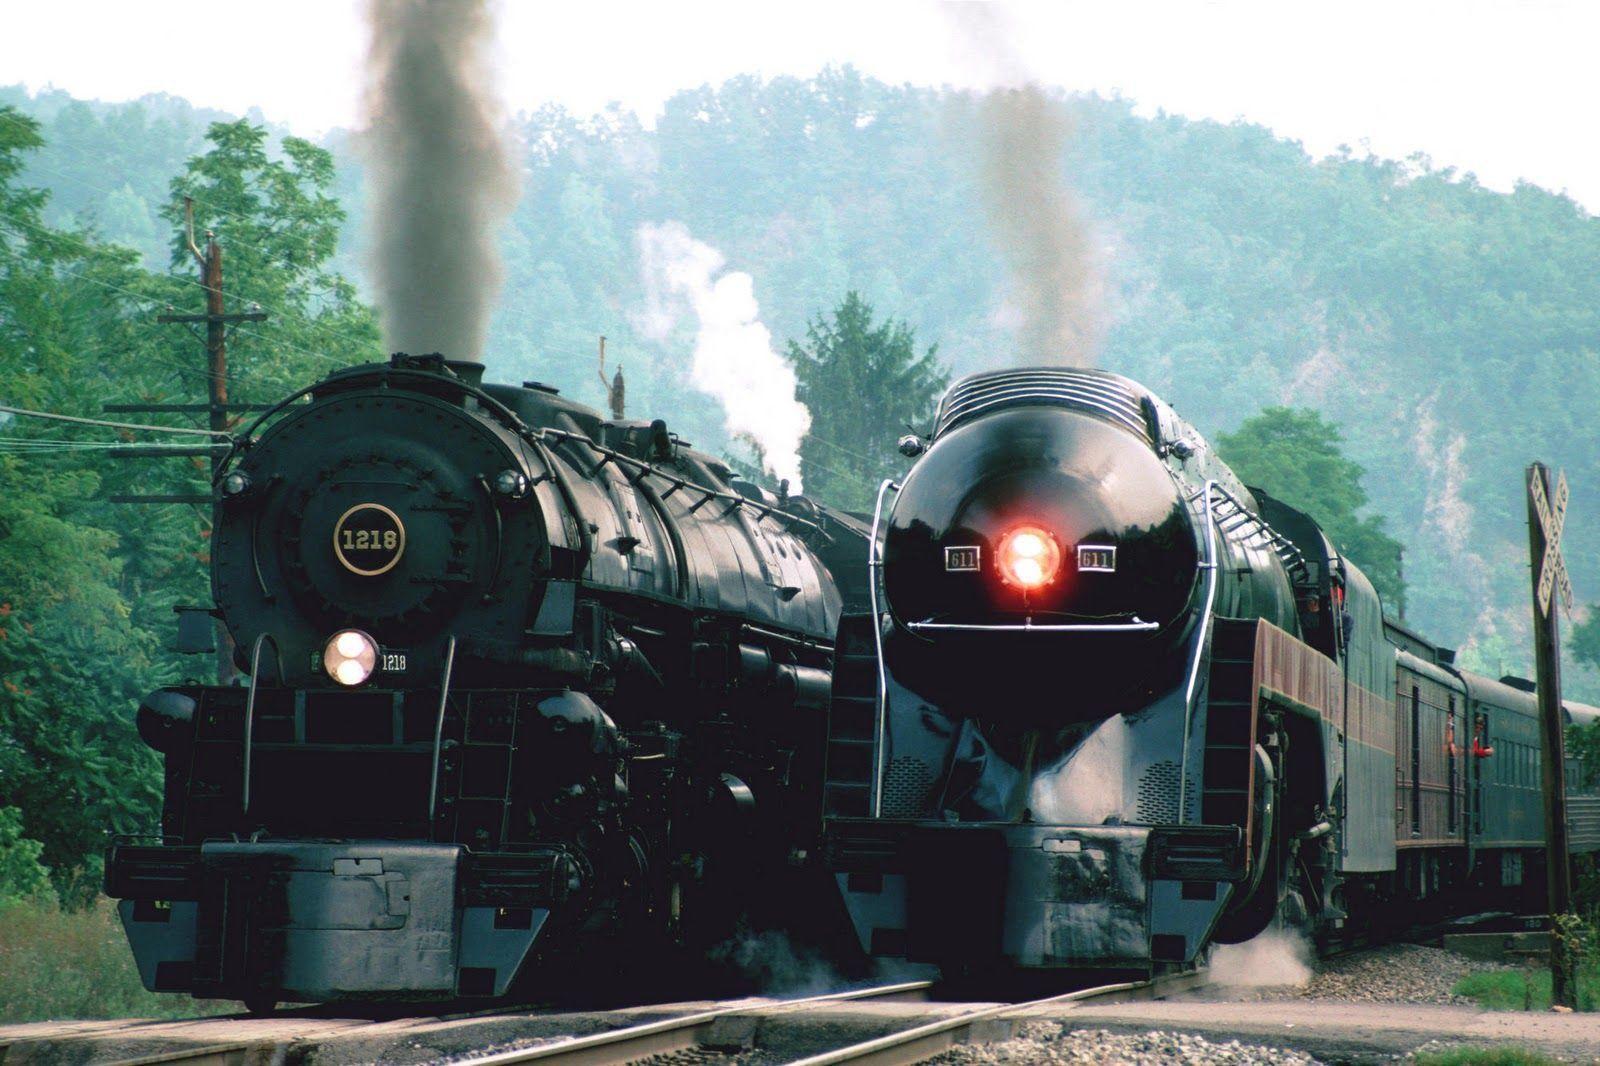 steam locomotive hd wallpapers - photo #1